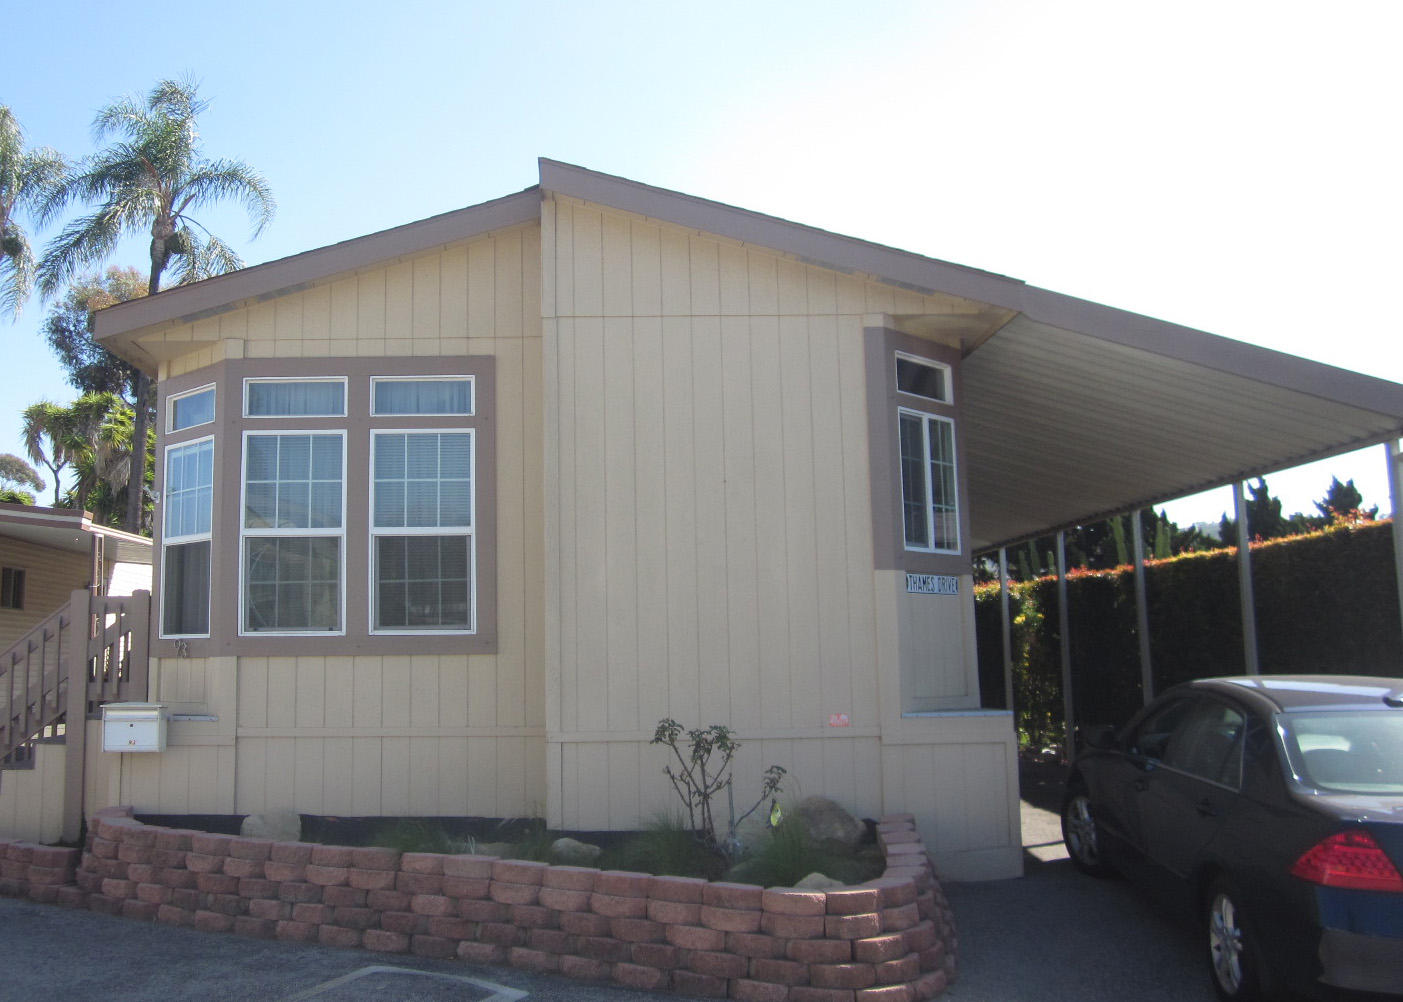 Property photo for 4280 Calle Real #93 Santa Barbara, California 93110 - 14-2246